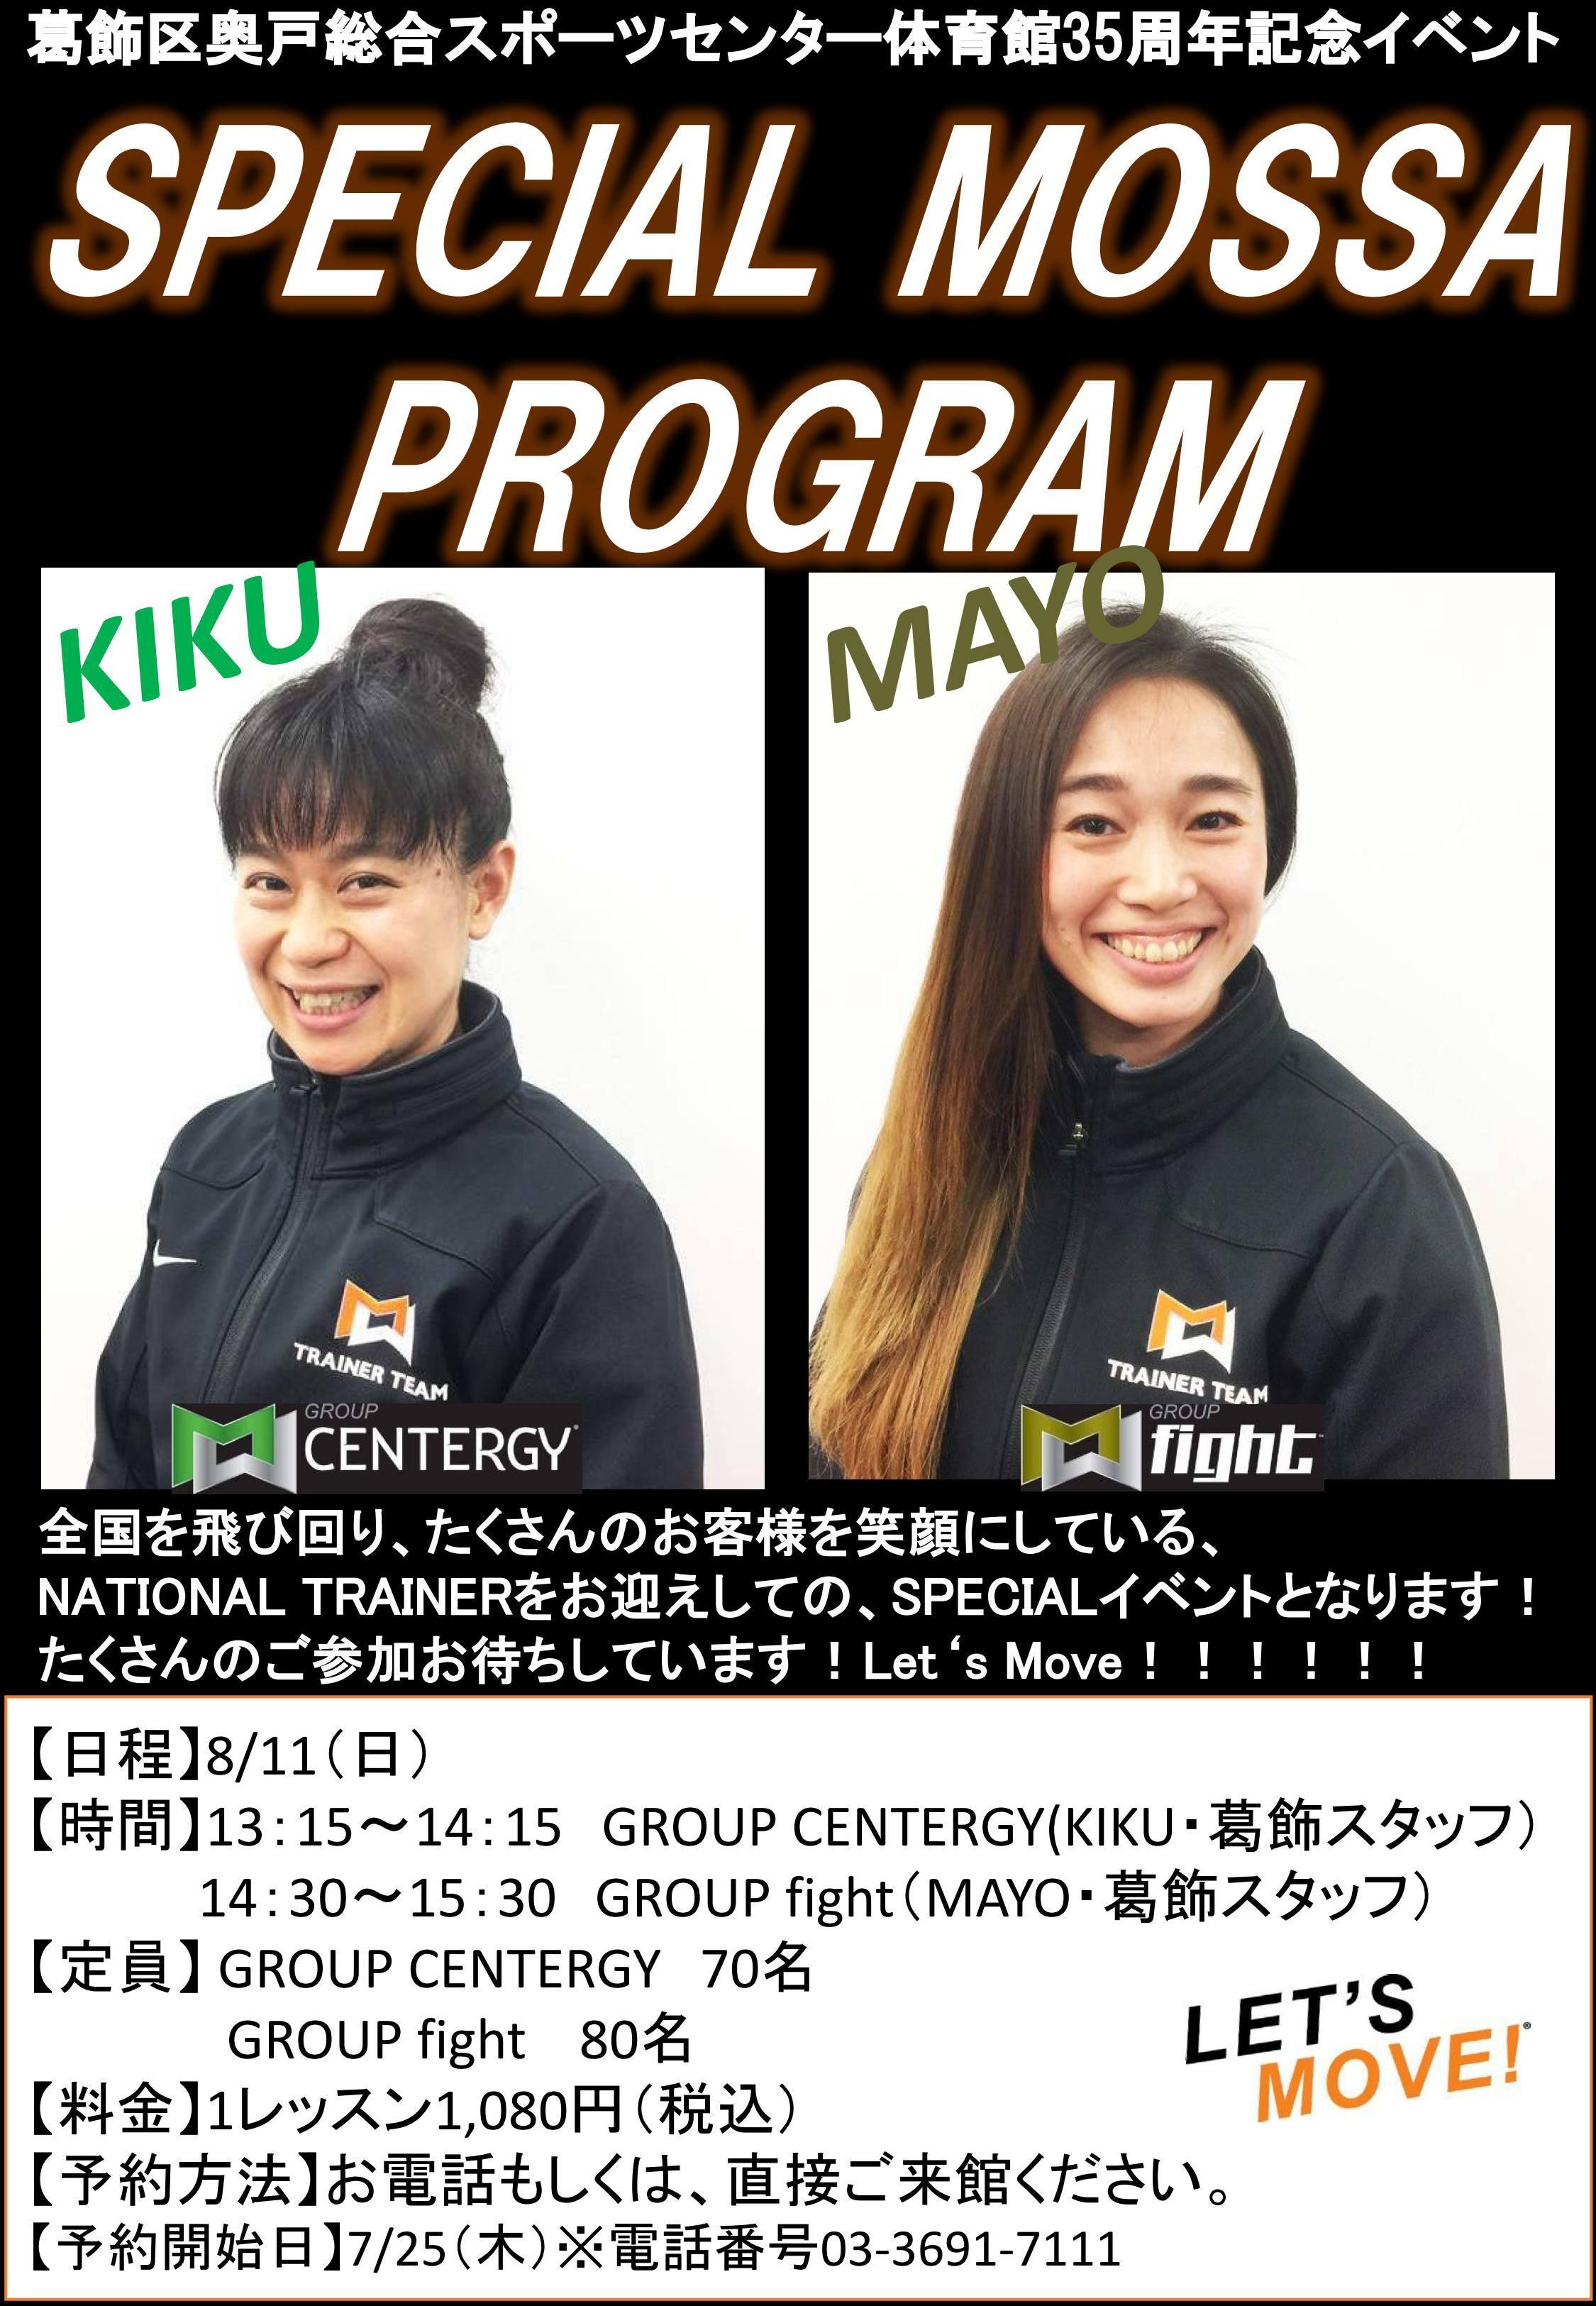 【KIKU・Mayo】葛飾区奥戸総合スポーツセンター体育館【GC・GF】東京